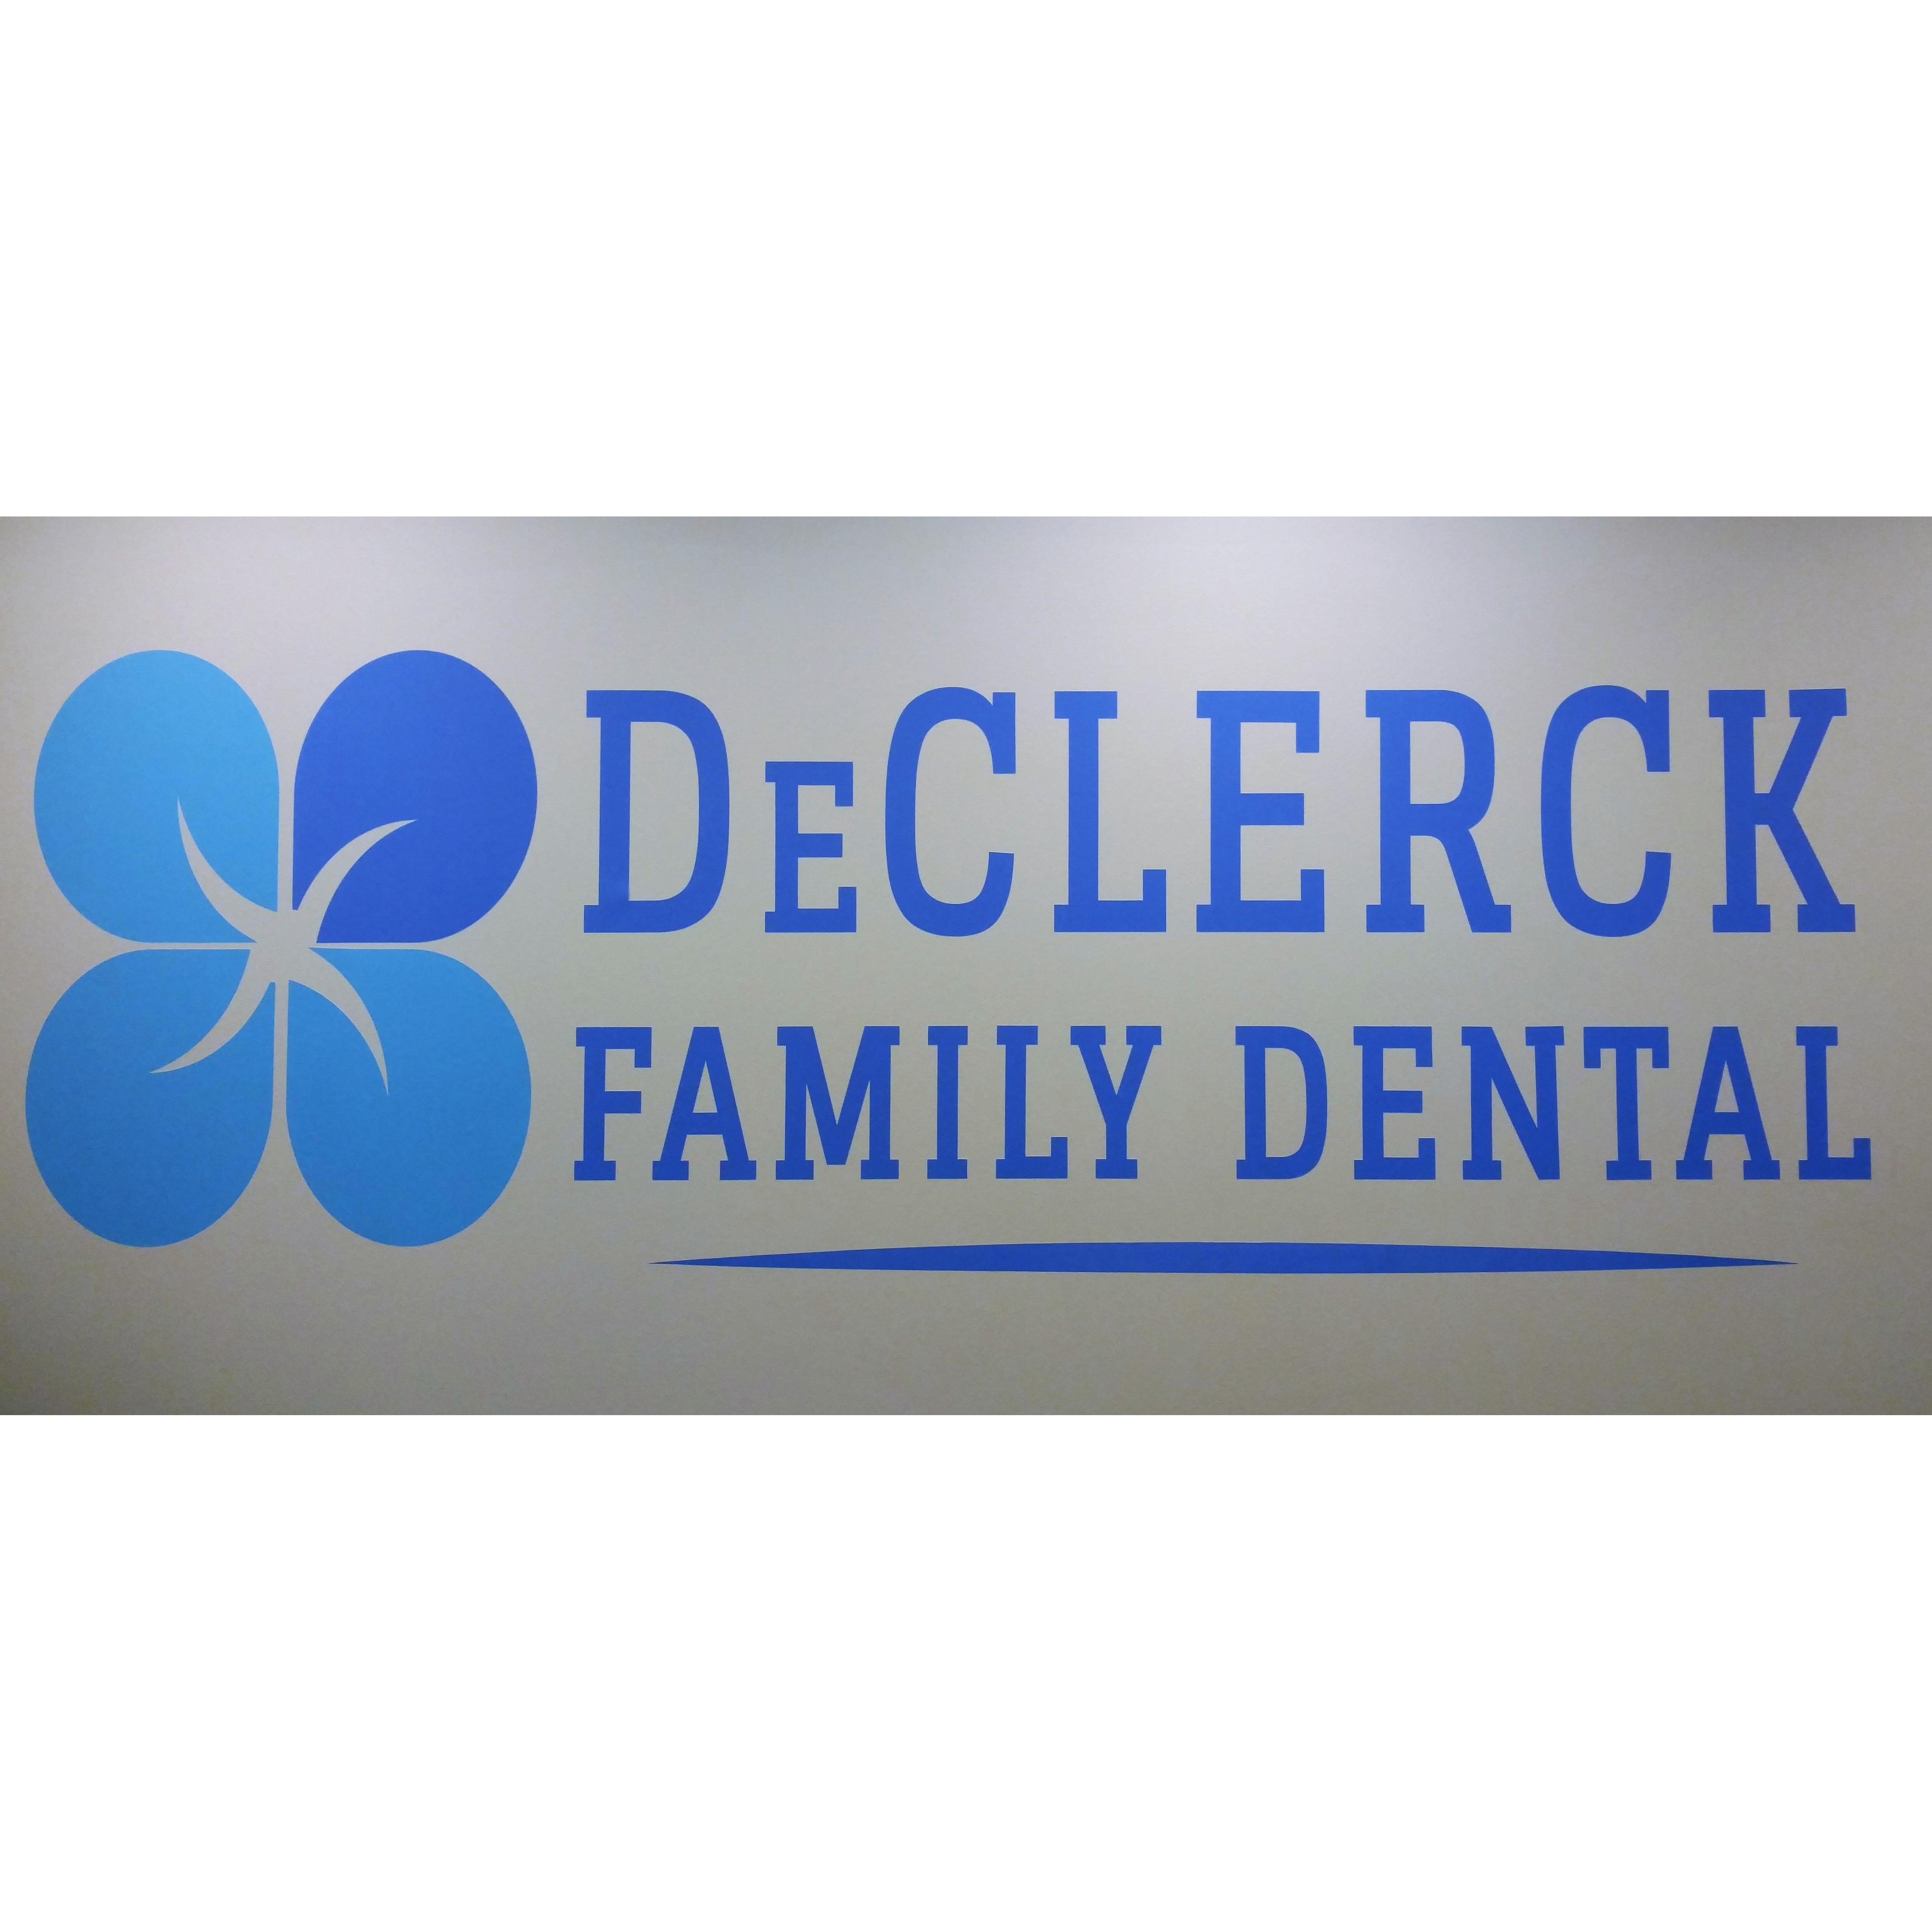 DeClerck Family Dental - Findlay, OH - Dentists & Dental Services